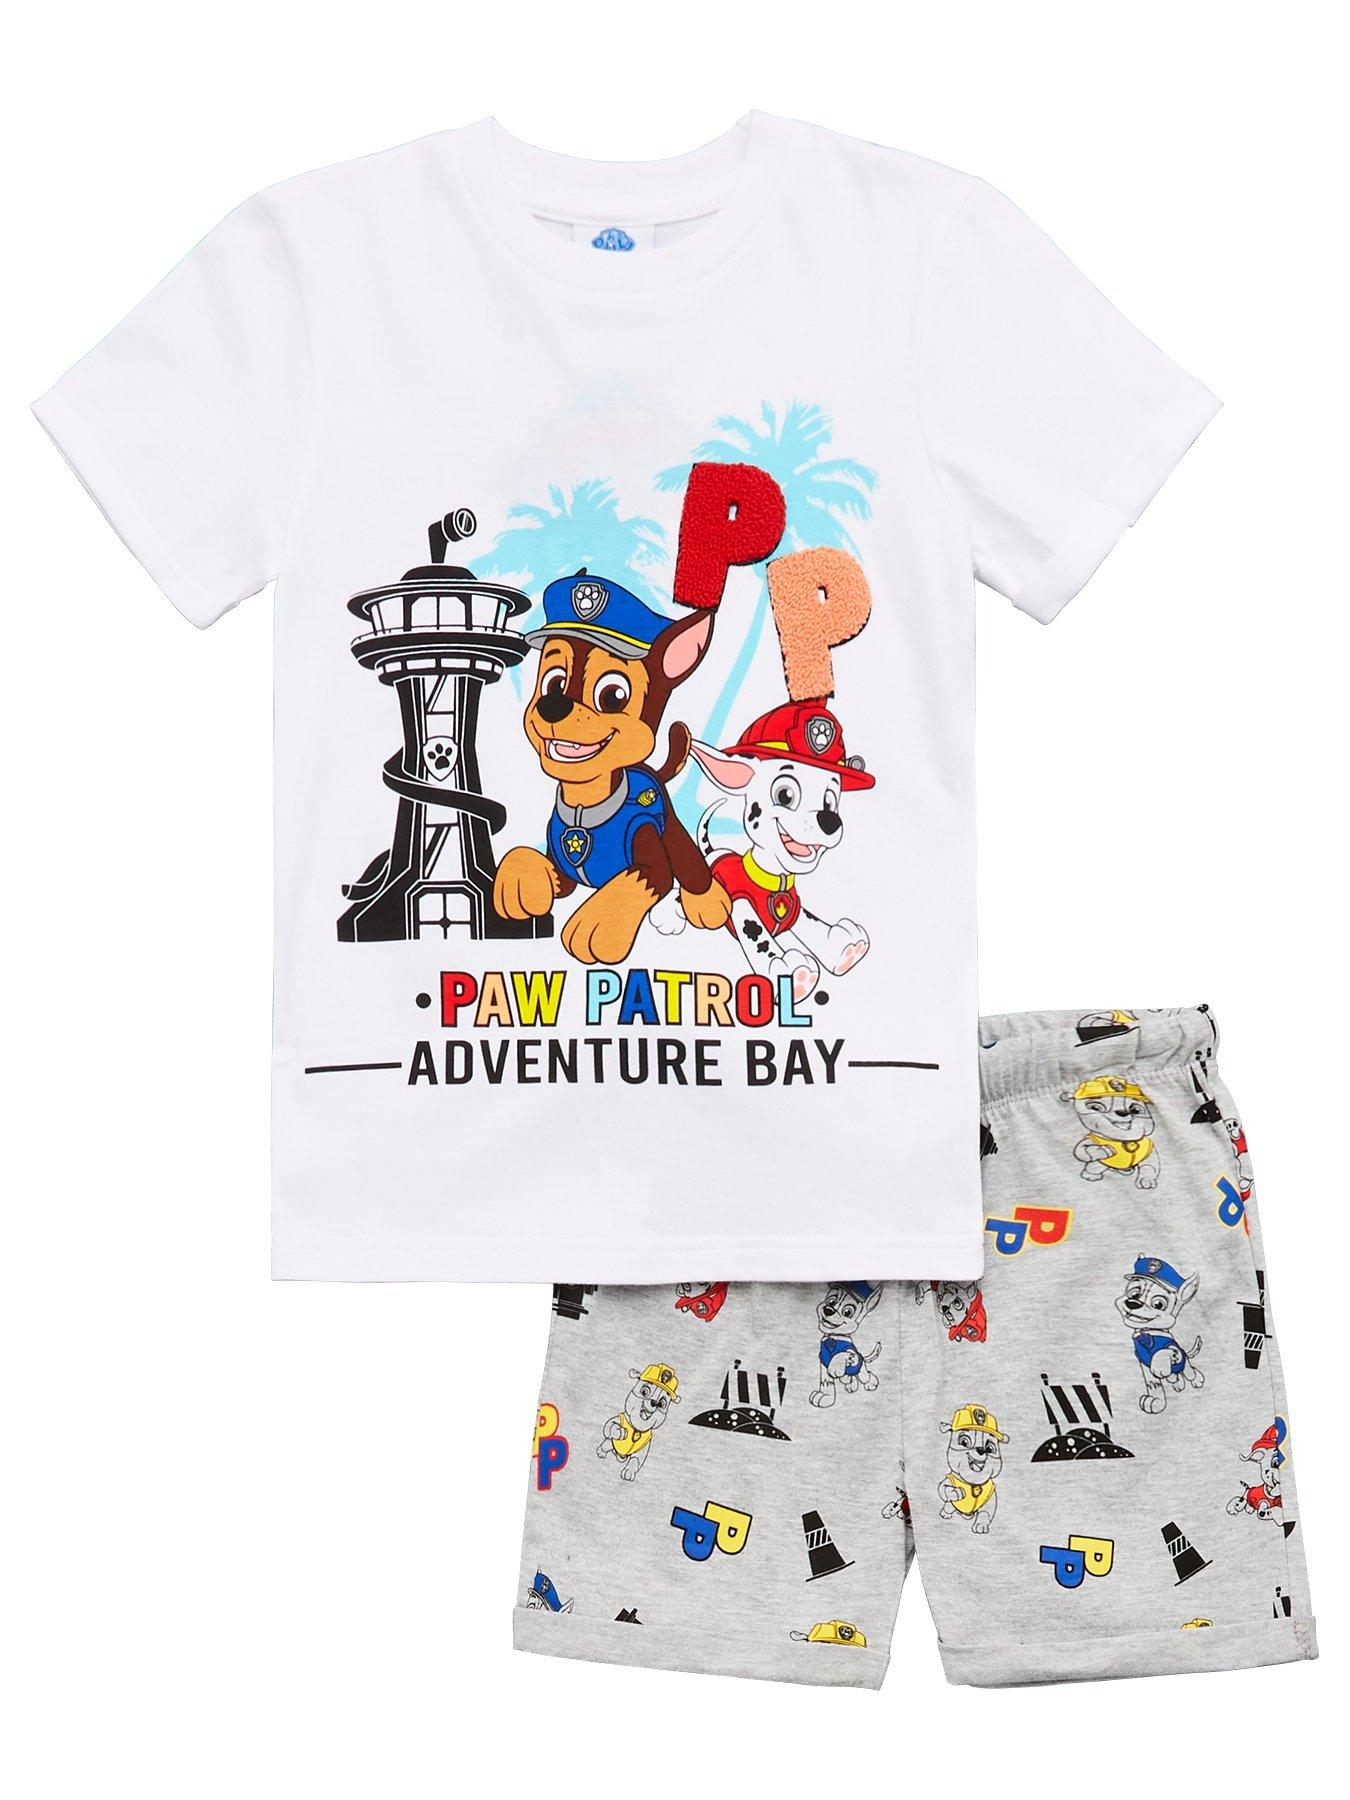 space life Cool Flame Blaze Racing Cars Short Sleeve Cotton Tee Shirt for 3-12Years Kids Boys